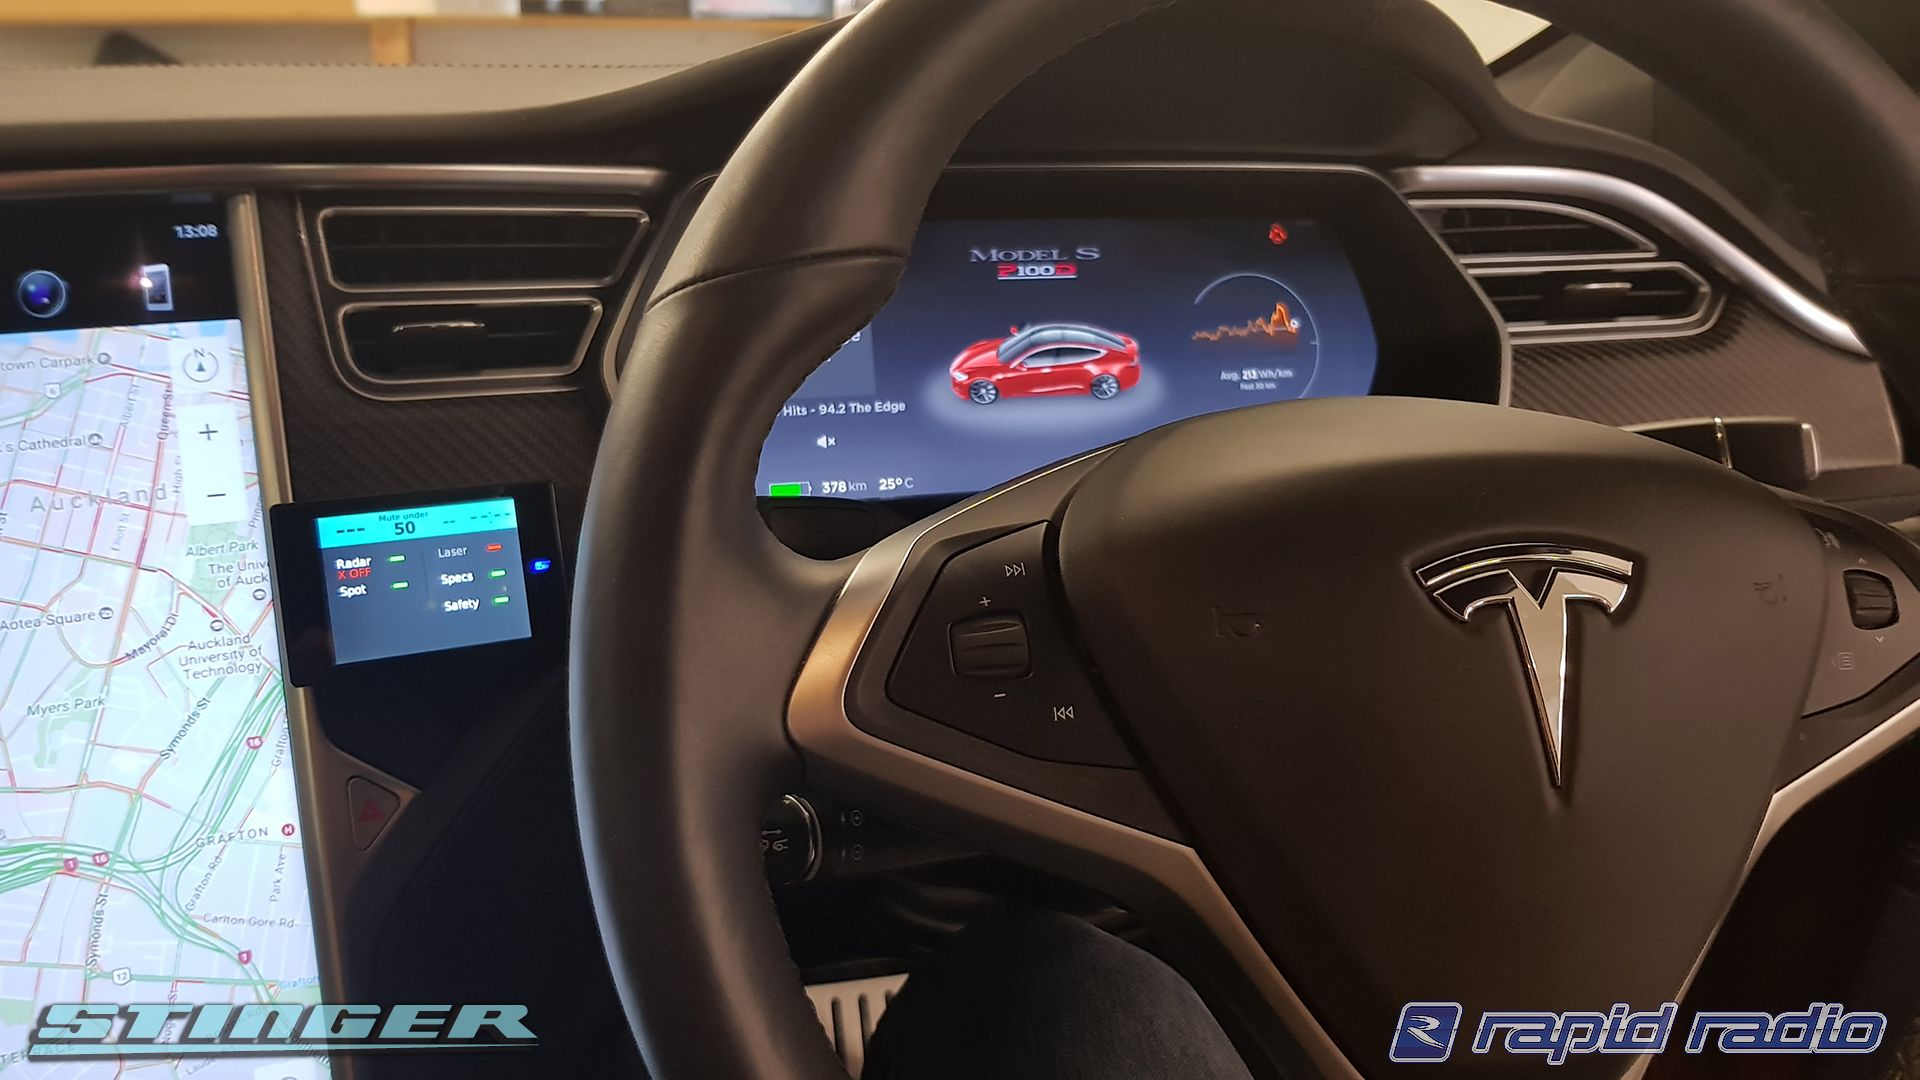 The Stinger VIP radar detector installed in a Tesla at Rapid